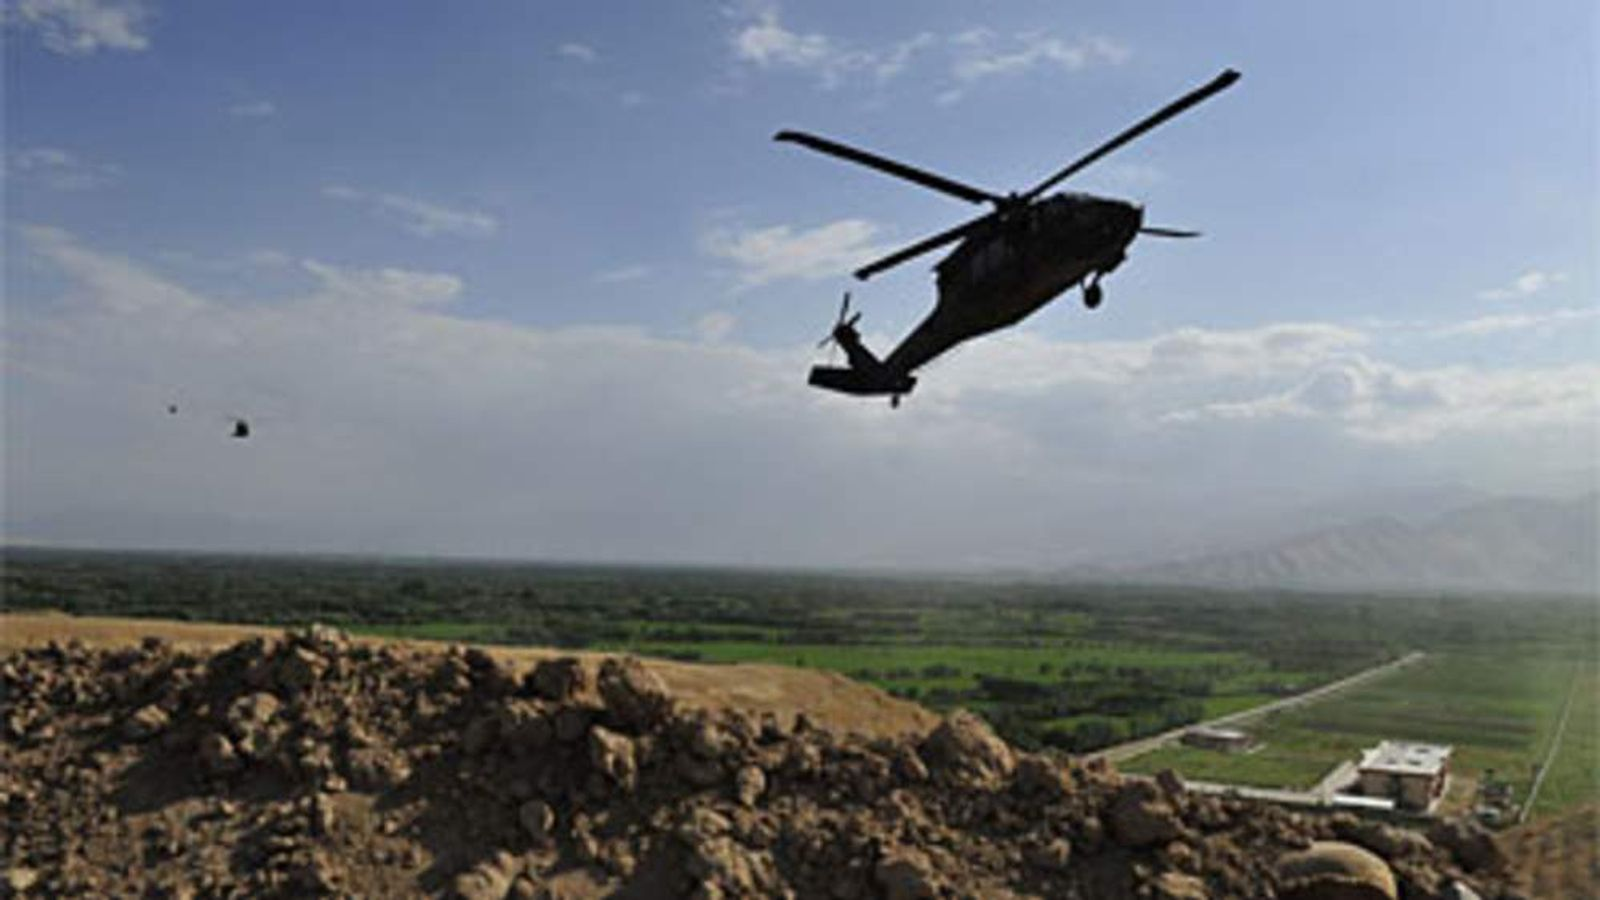 Black Hawk helicopter in Afghanistan